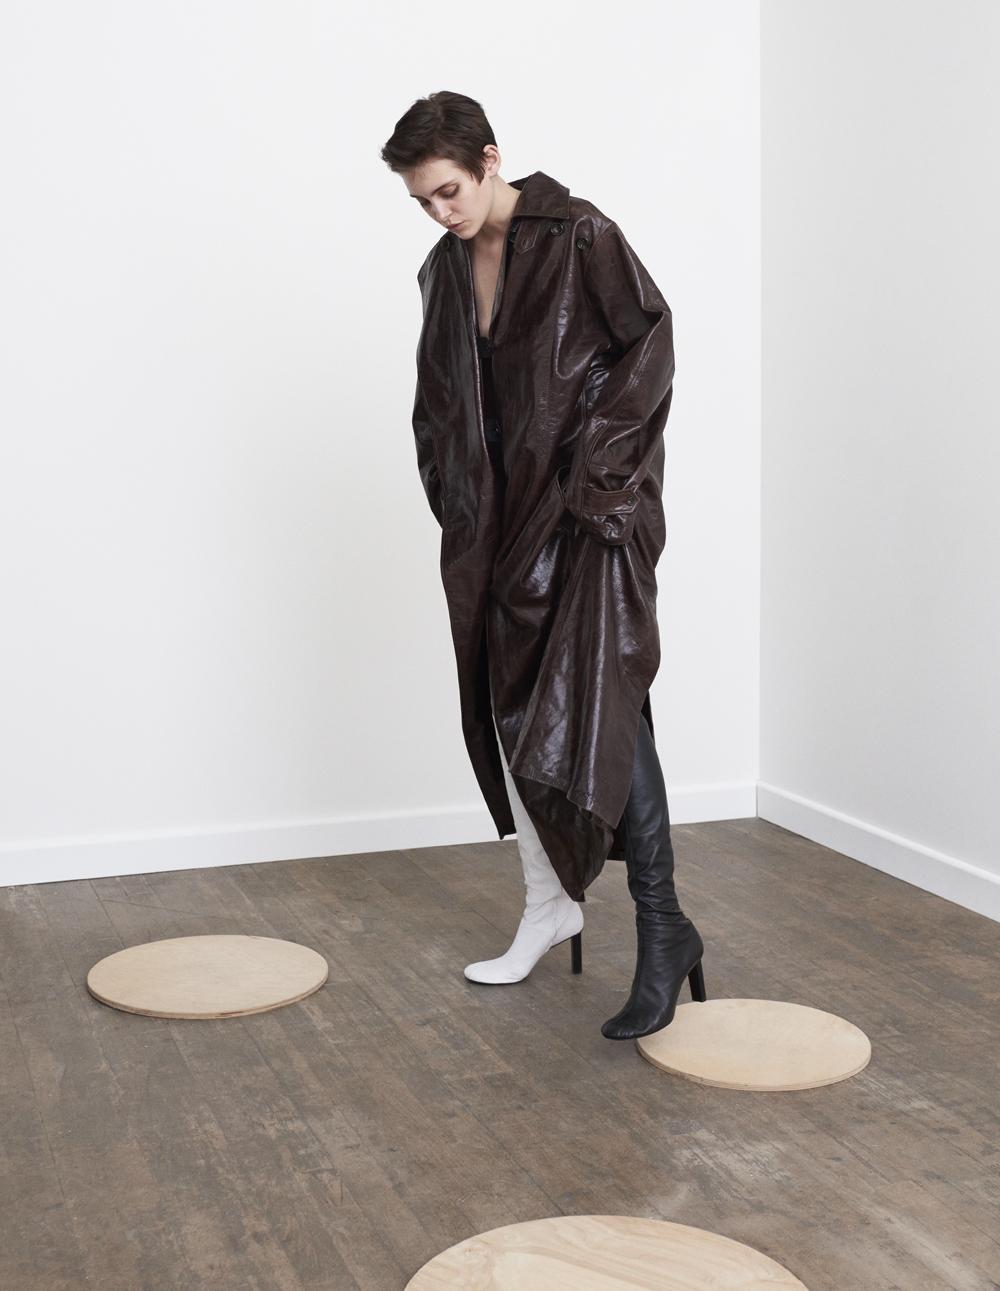 Assisting Daniela Suarez for Jungle-Works, in collaboration with Joseph Fashion.